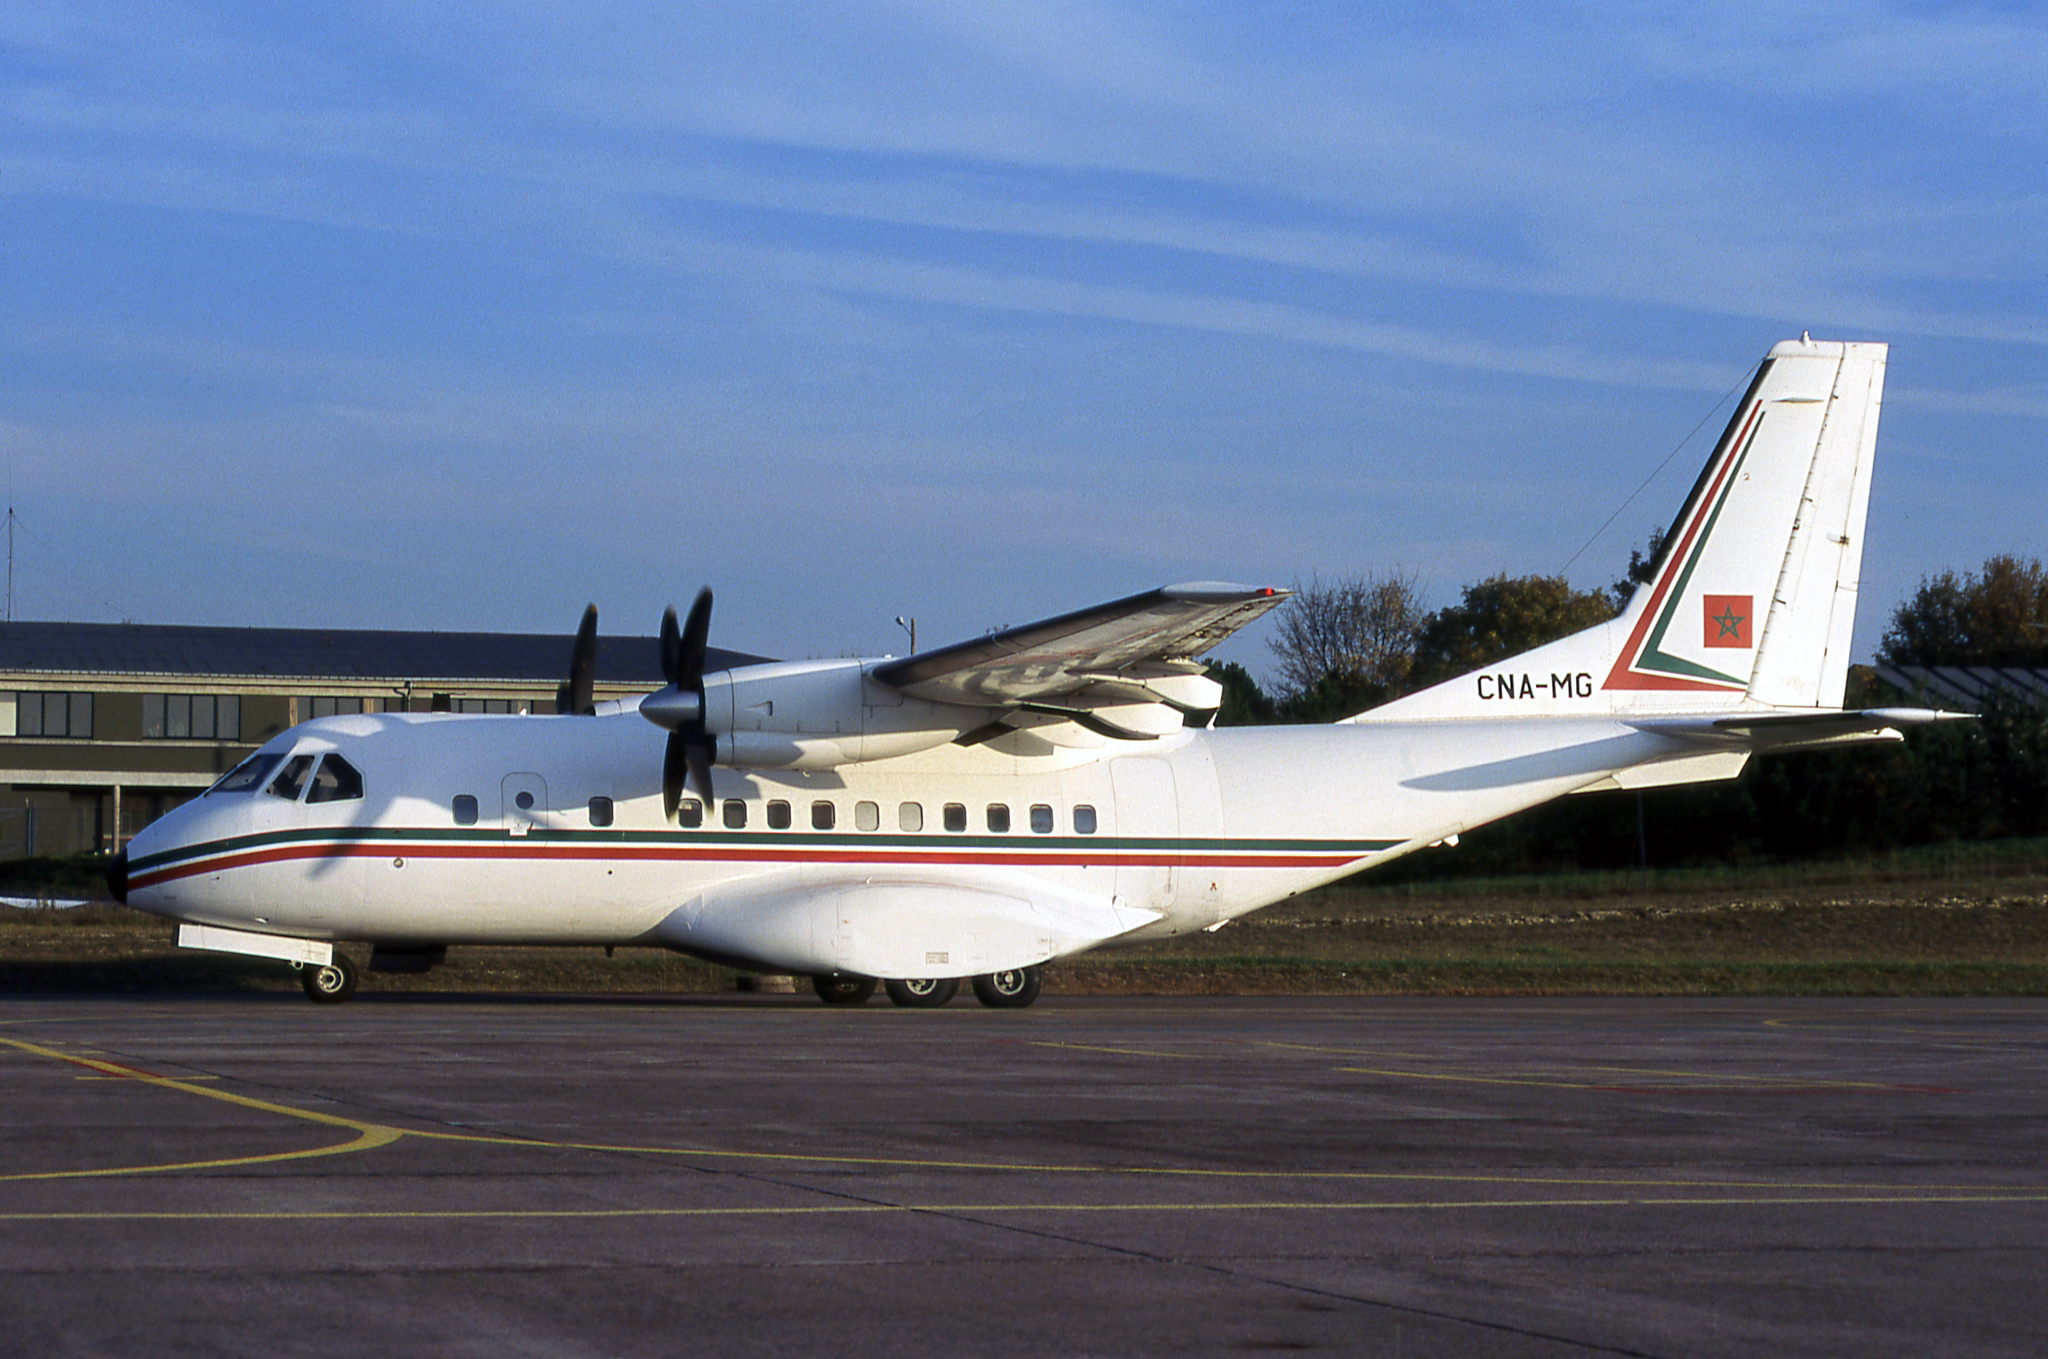 FRA: Photos d'avions de transport - Page 38 47814409581_db1d894b4a_o